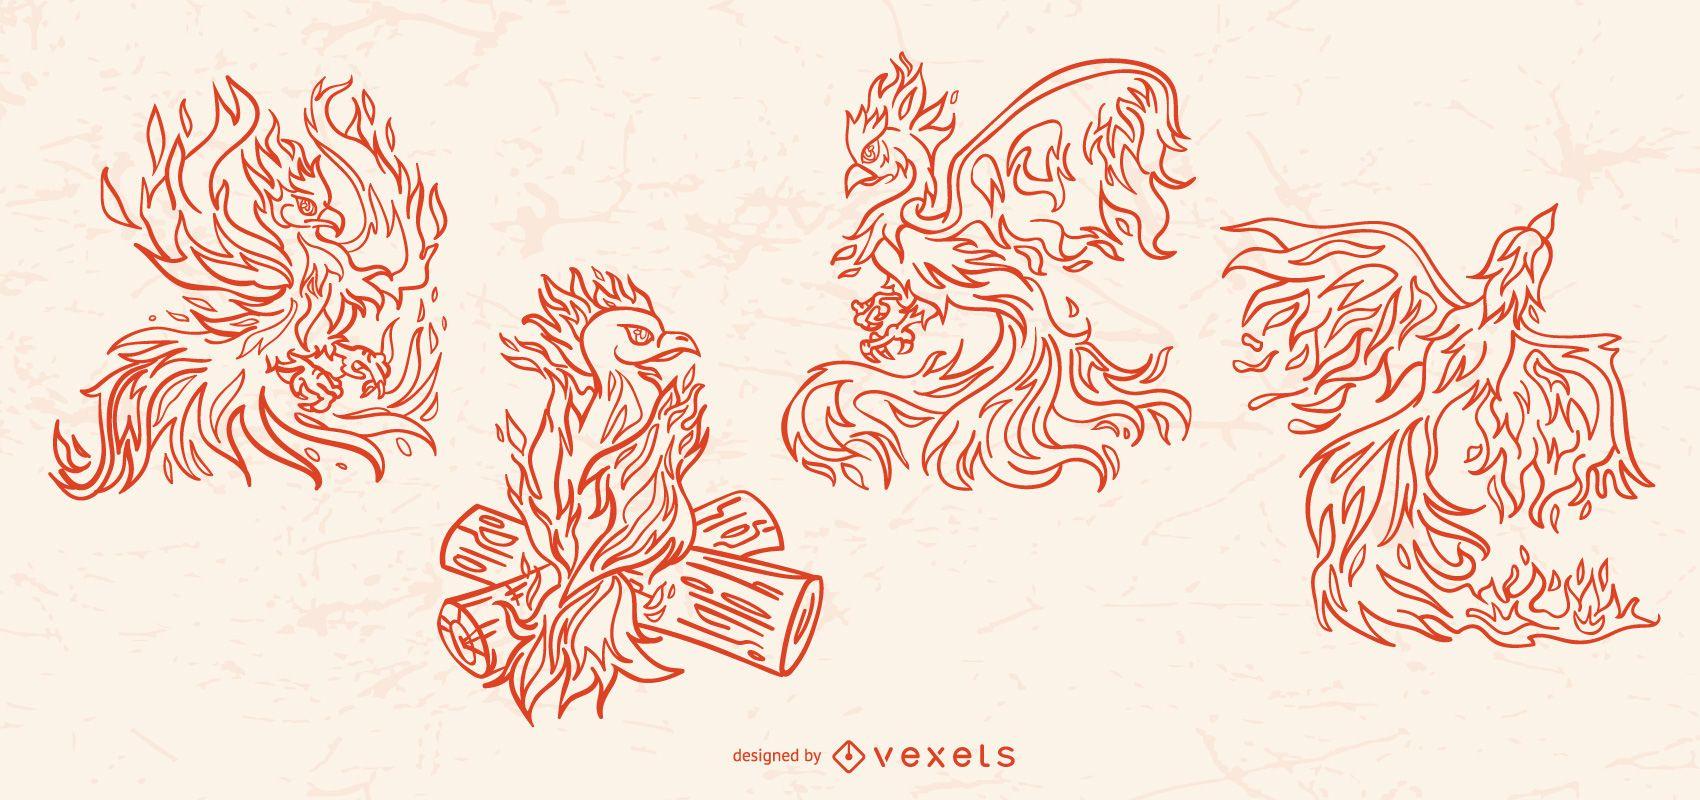 Phoenix Stroke Illustration Creature Set